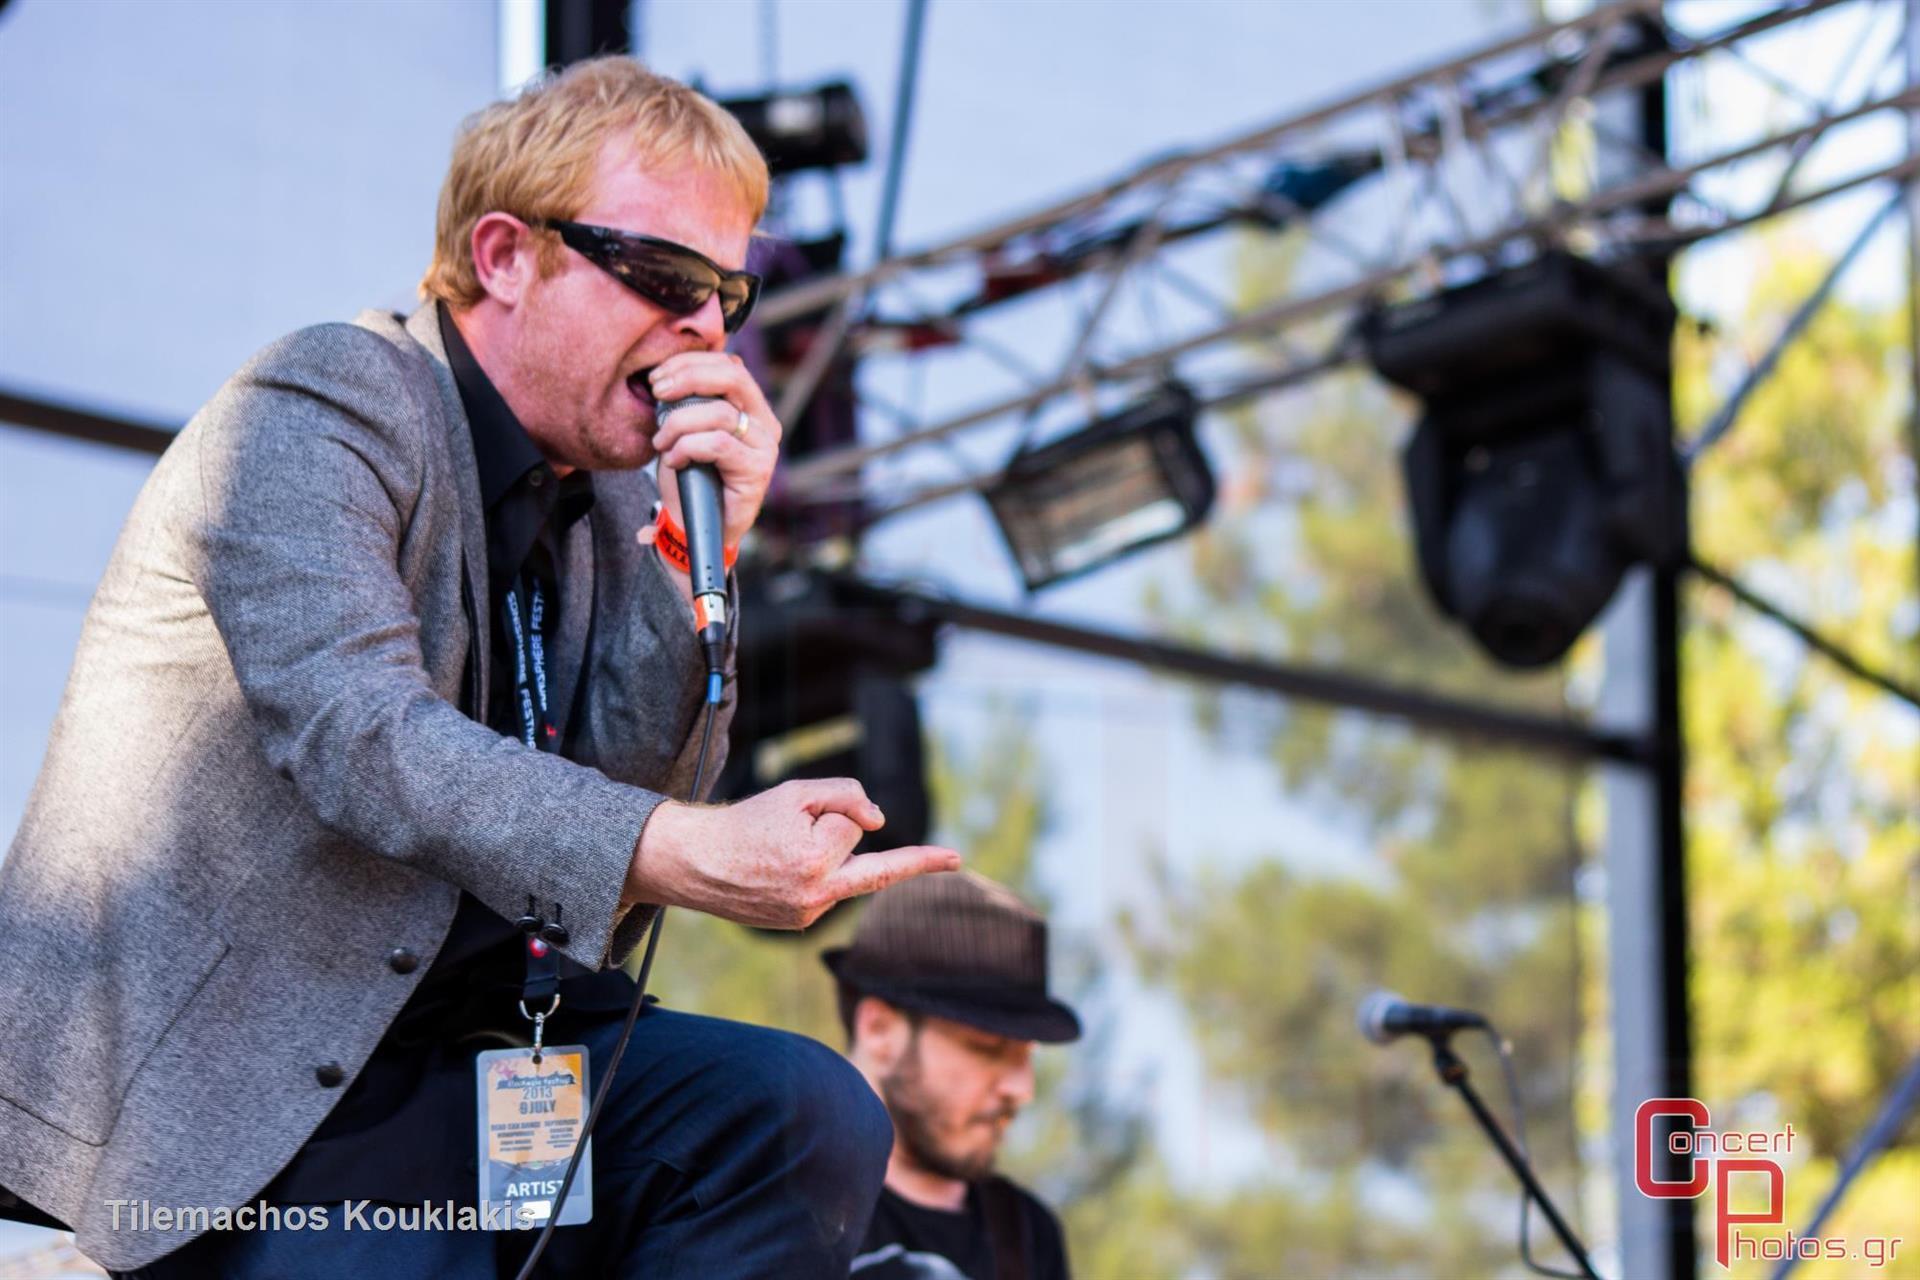 Craig Walker-Craig Walker photographer: Tilemachos Kouklakis - concertphotos_-0439